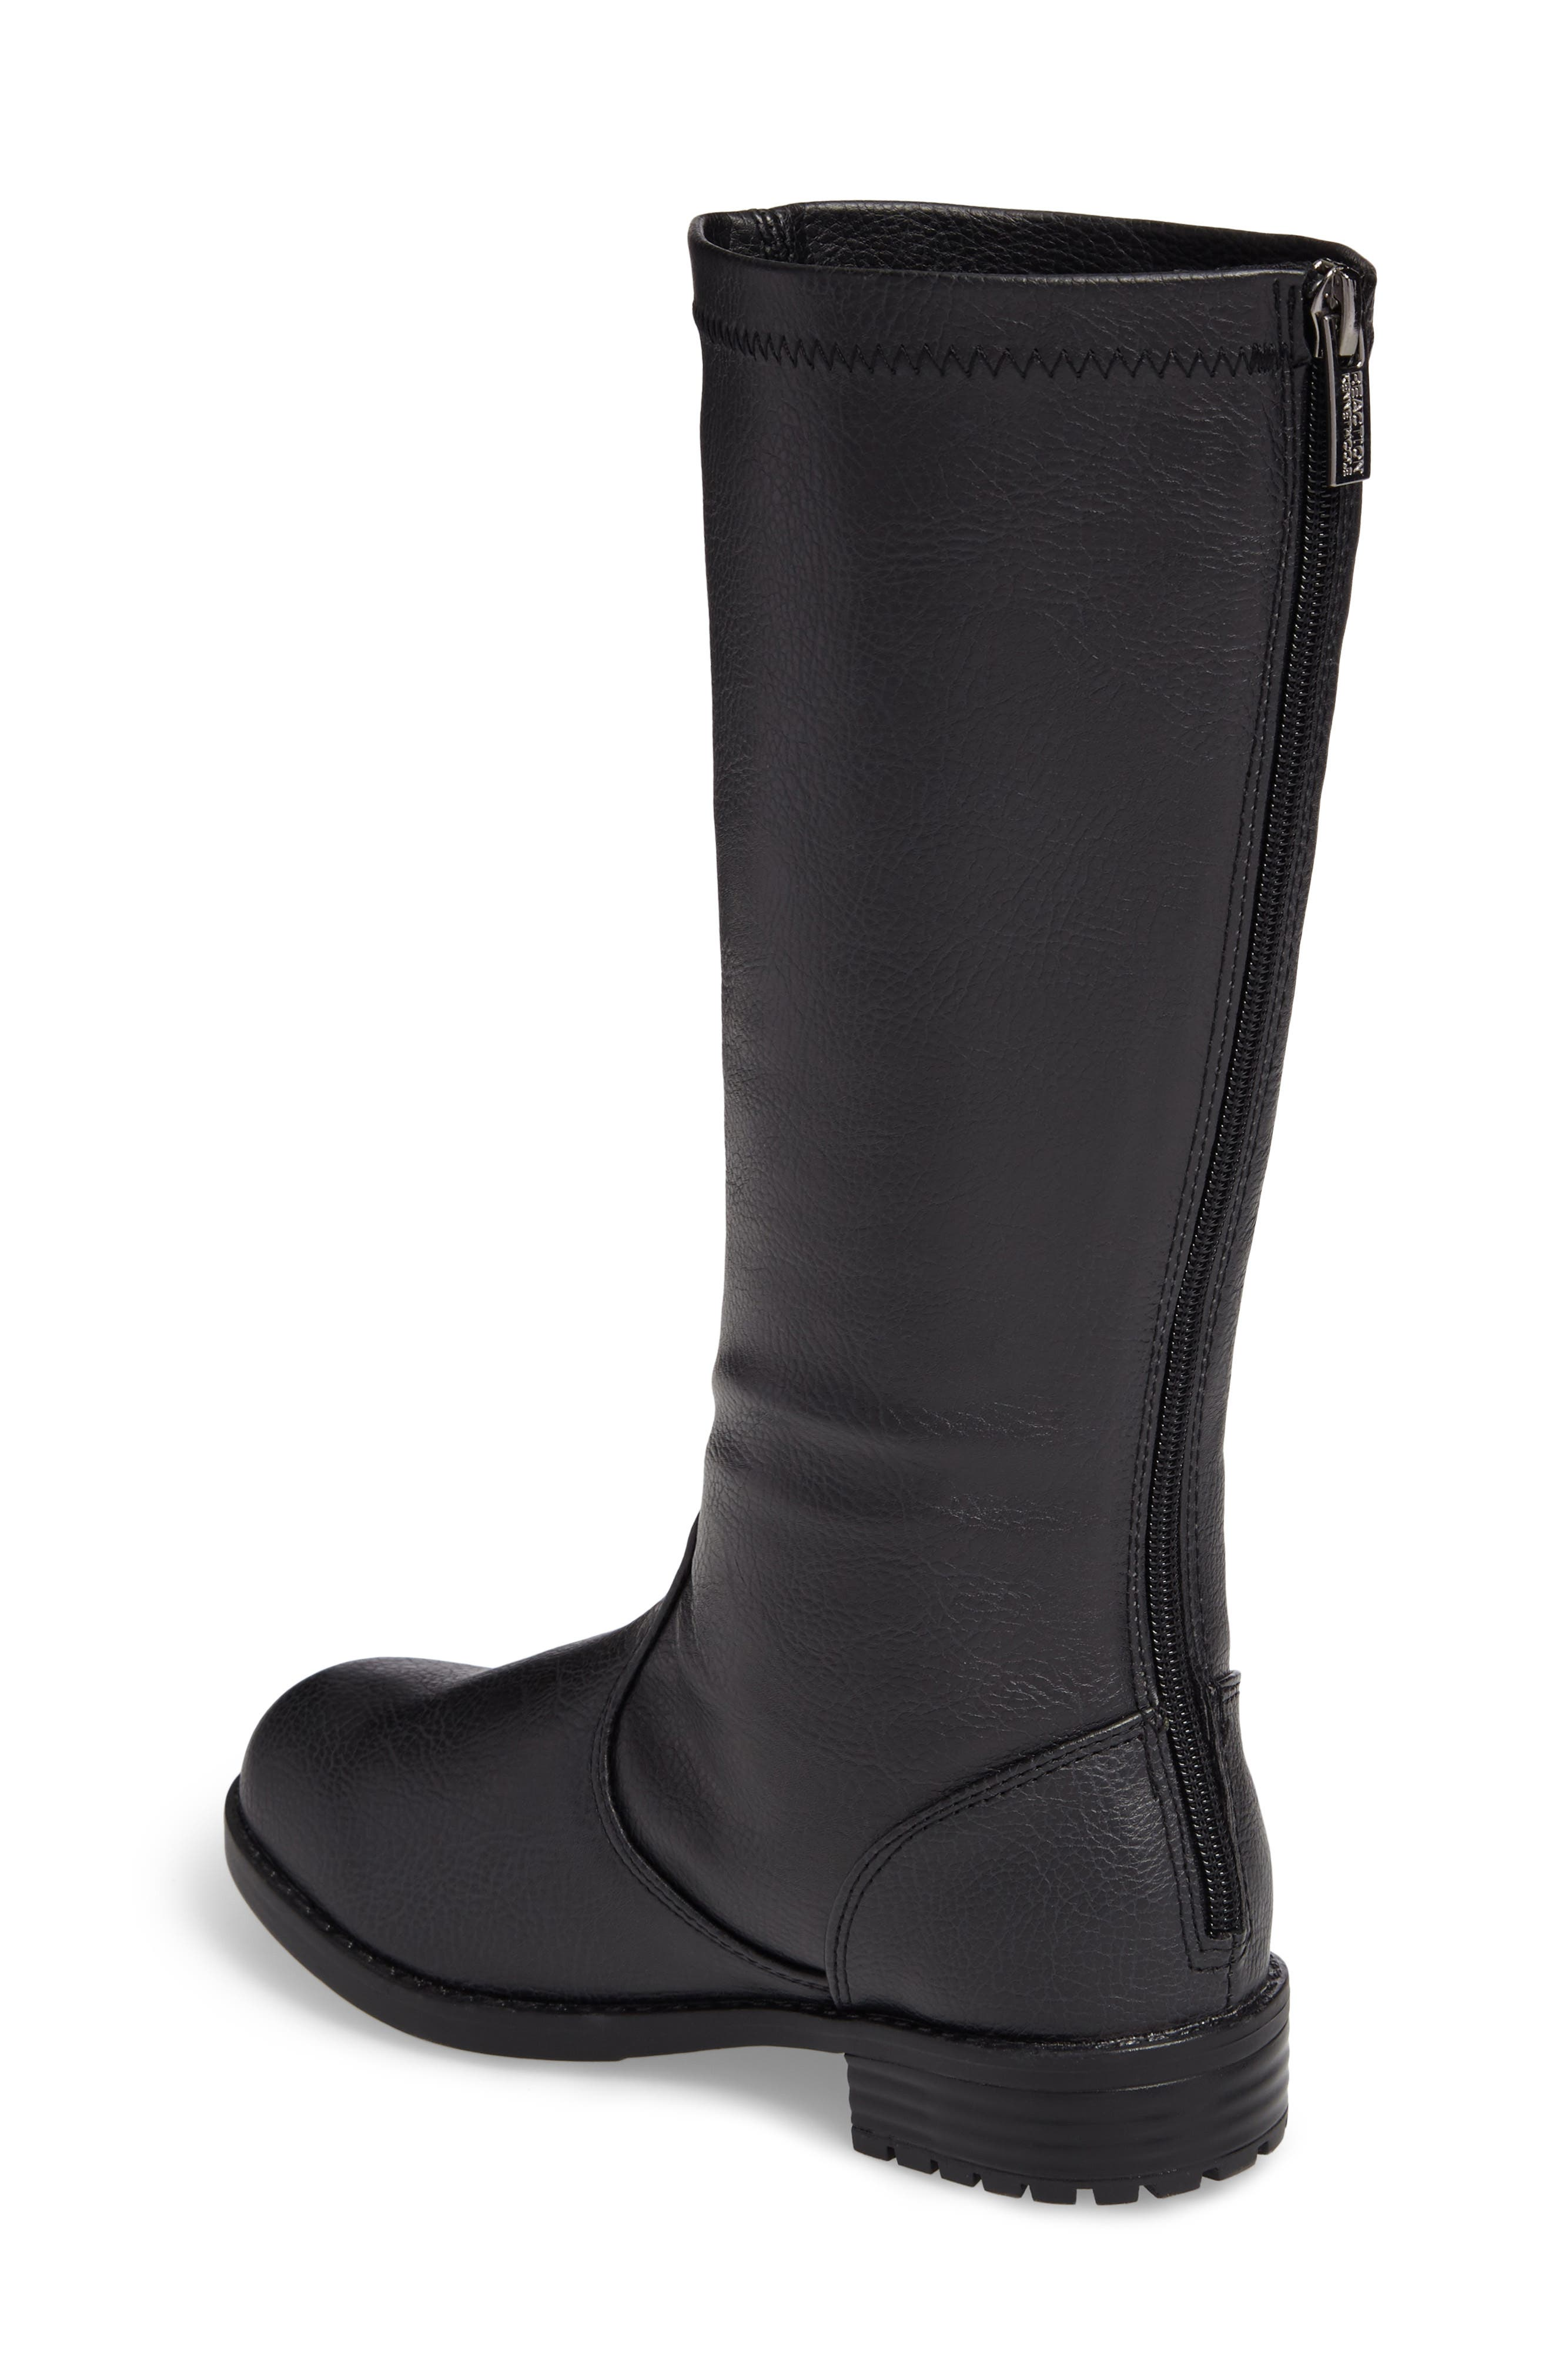 Autumn Stretch Boot,                             Alternate thumbnail 2, color,                             Black Faux Leather